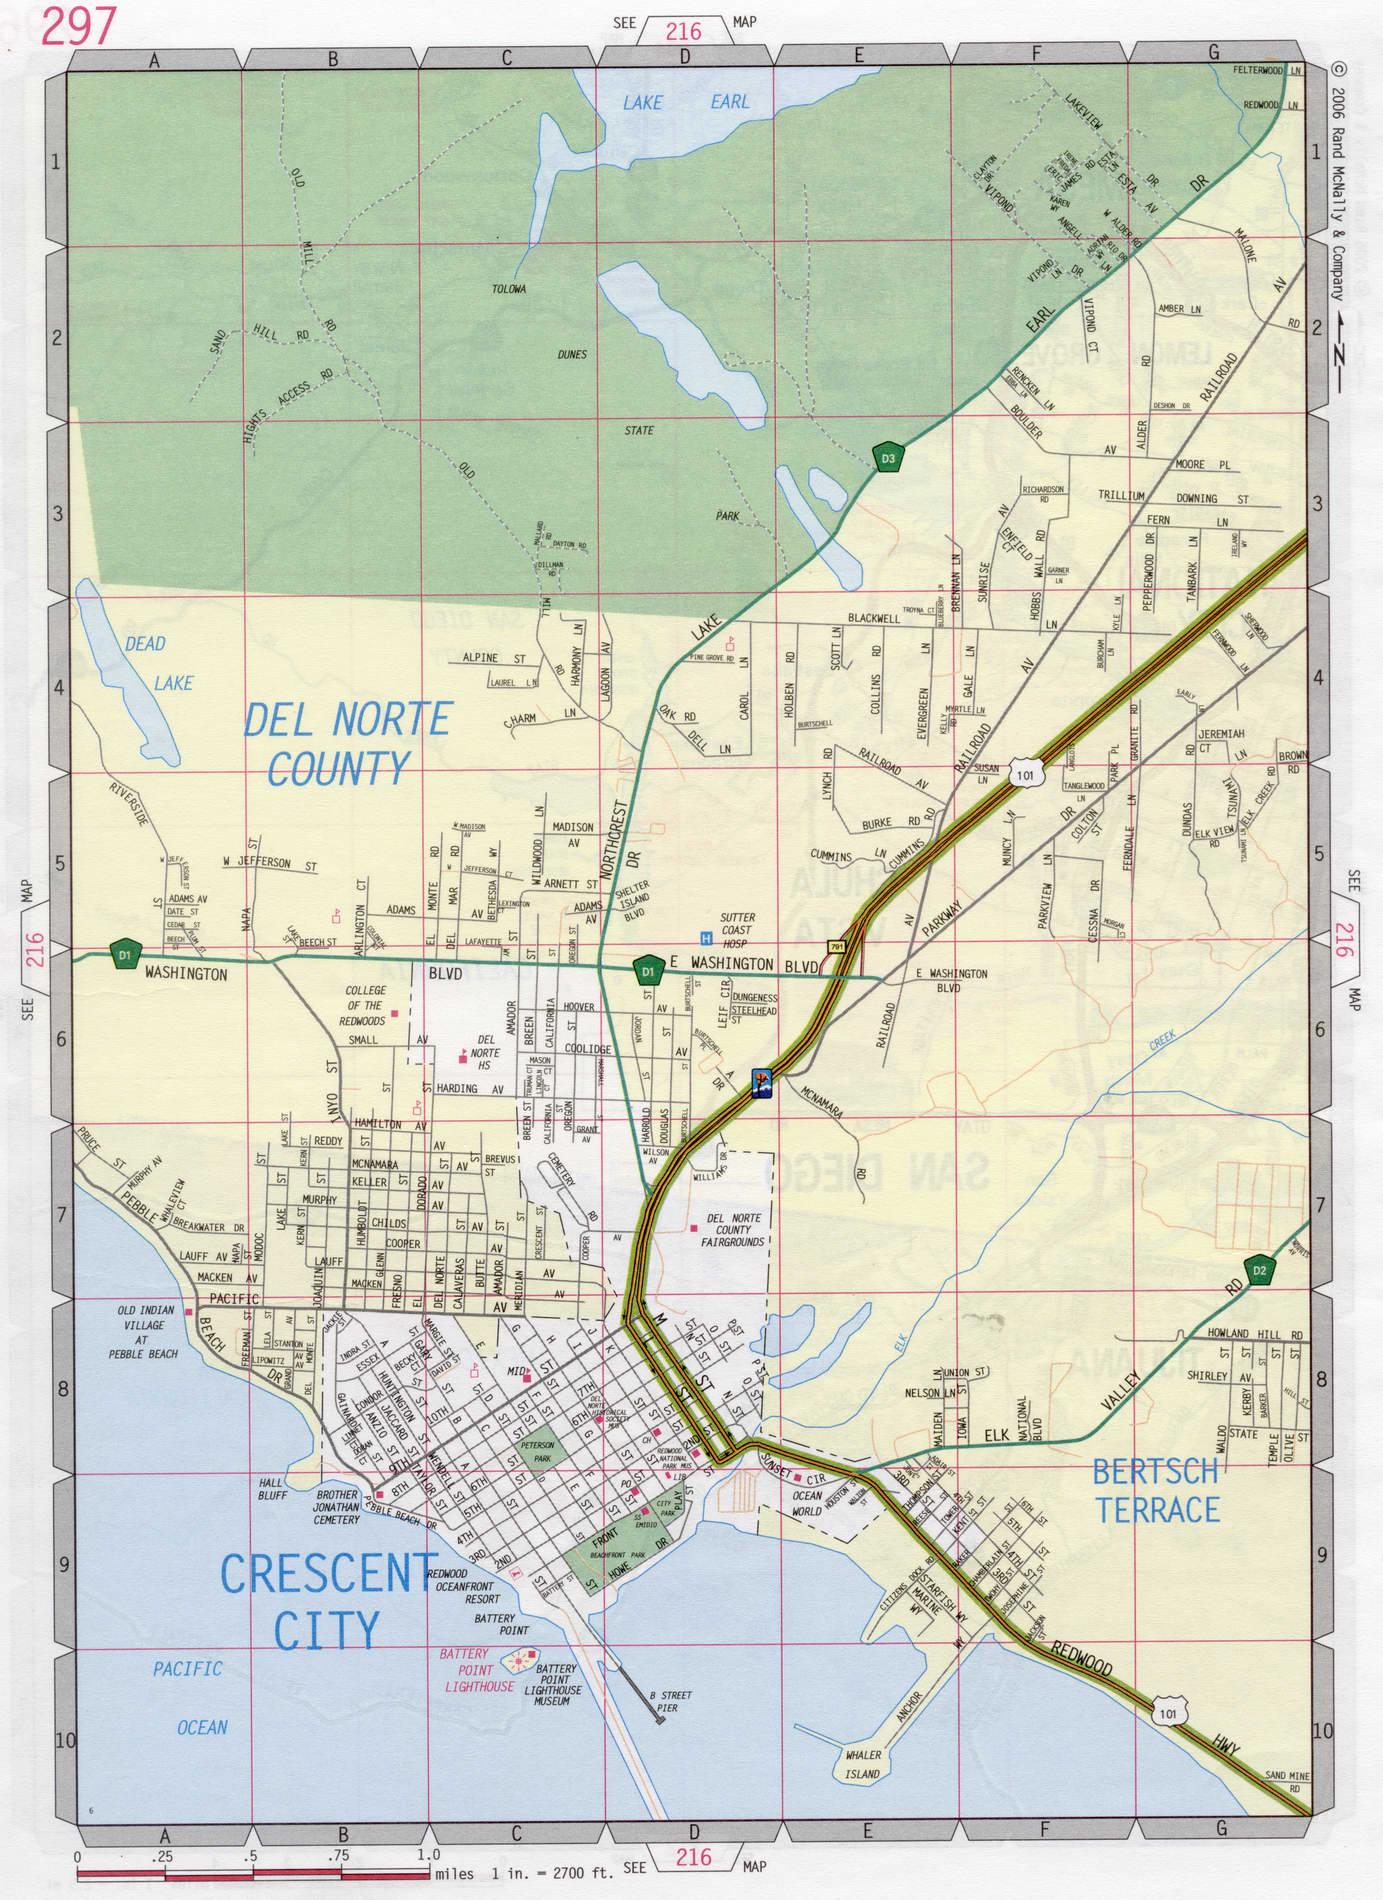 City California Map.Crescent City Road Map